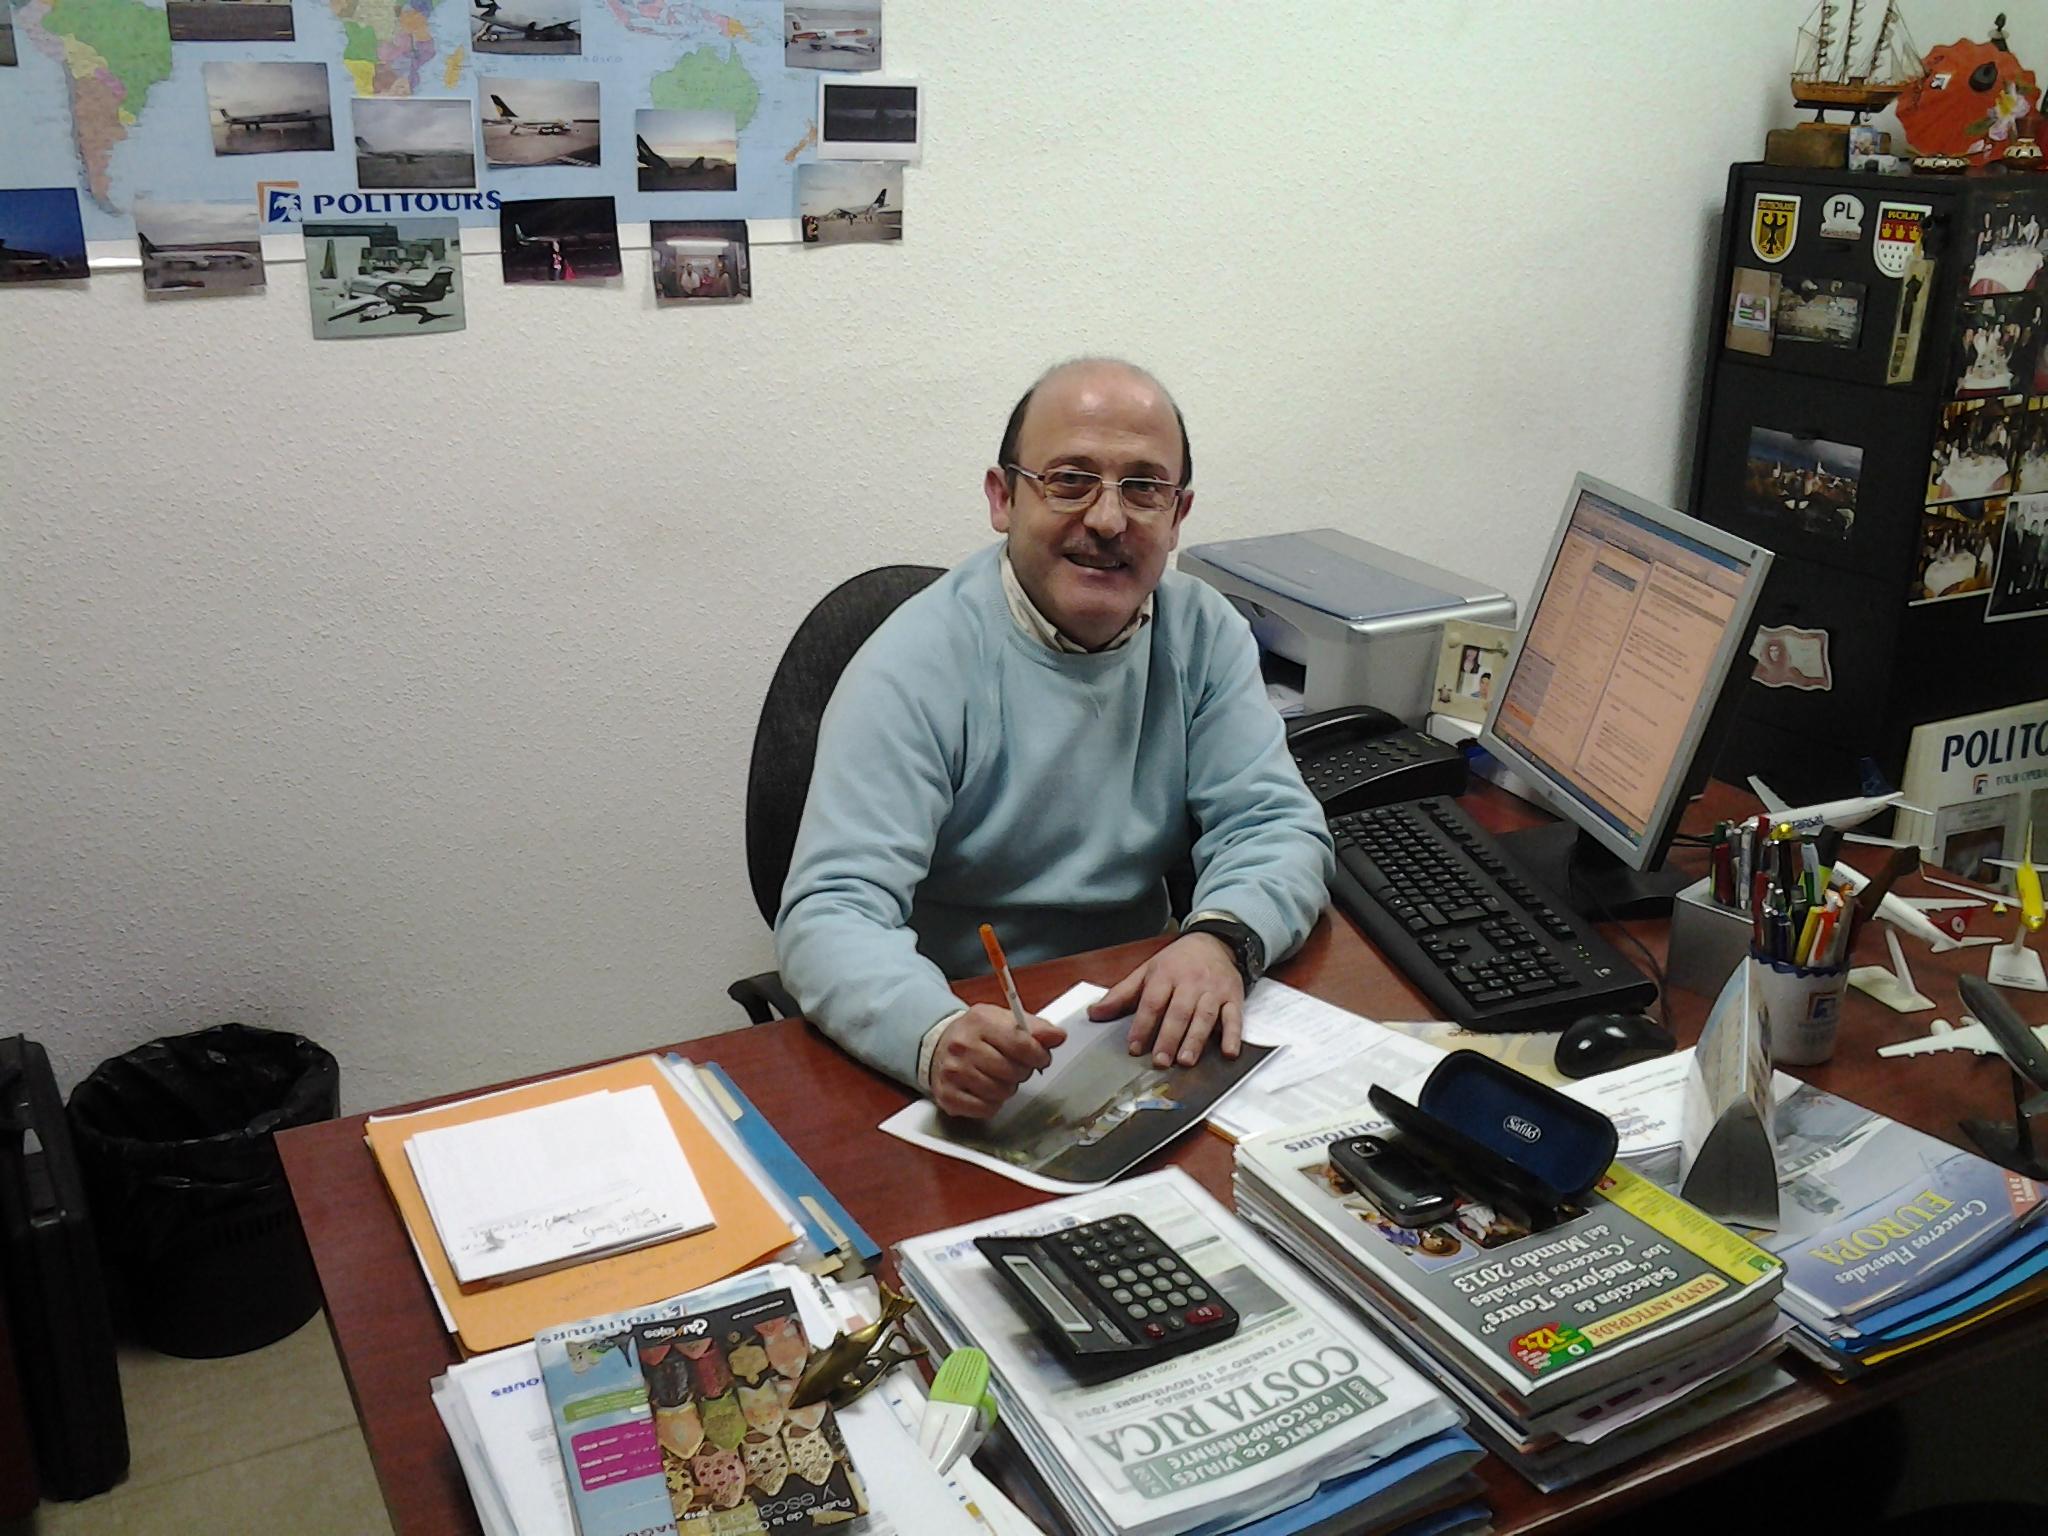 Entrevista a José Joaquin Nuez de Politours (Aragón)